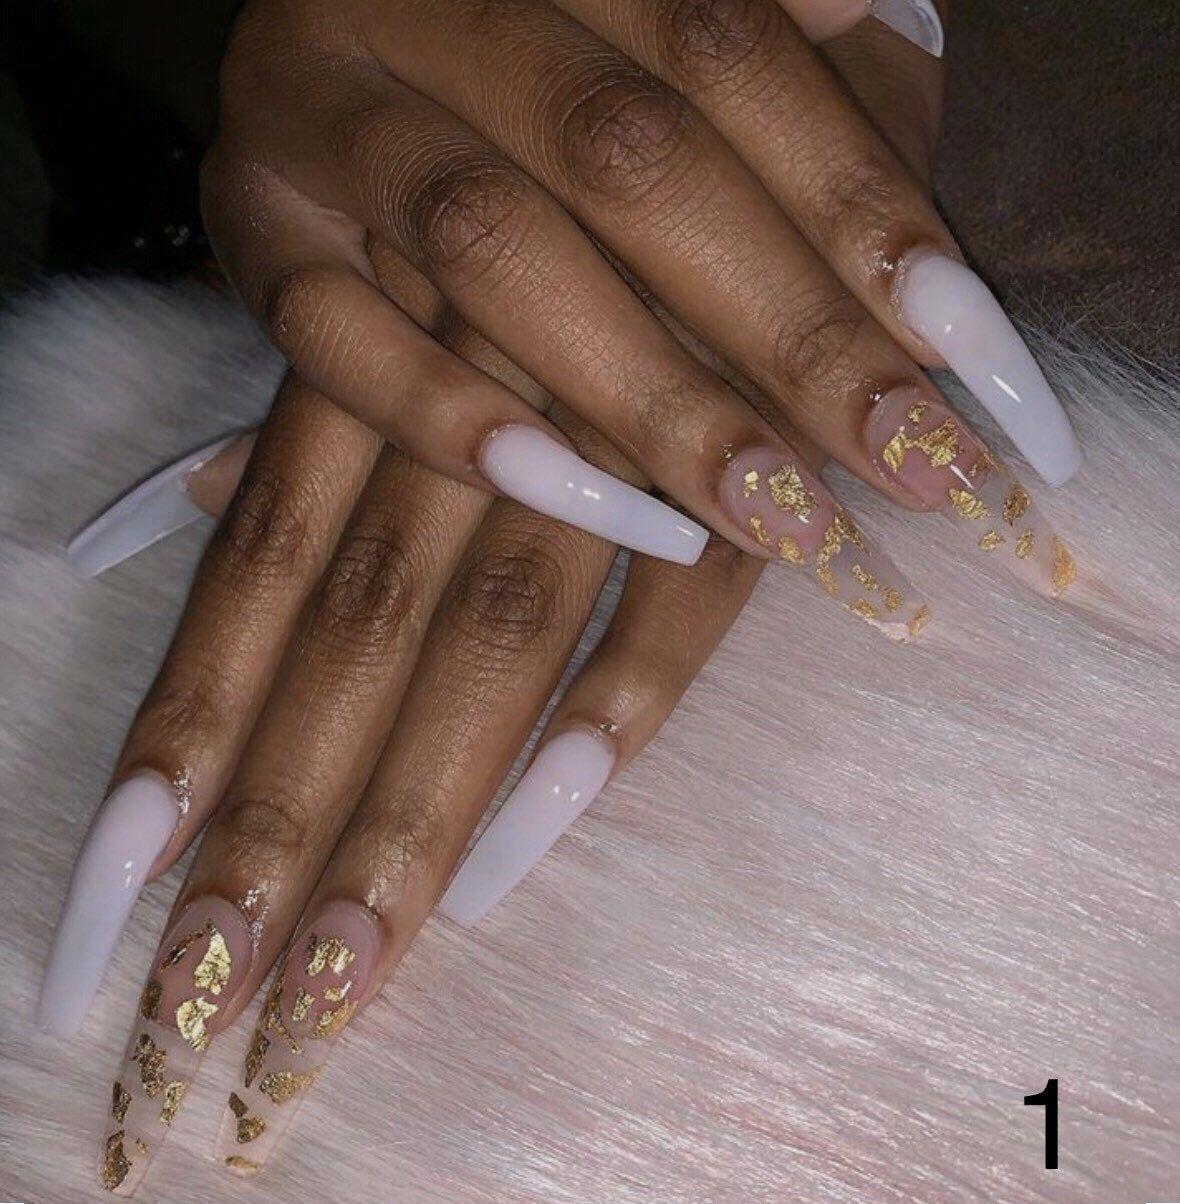 Custom Press On Acrylic Nails Set Of 10 Any Size Shape Etsy In 2020 Acrylic Nail Set Fake Nails Coffin Nails Designs